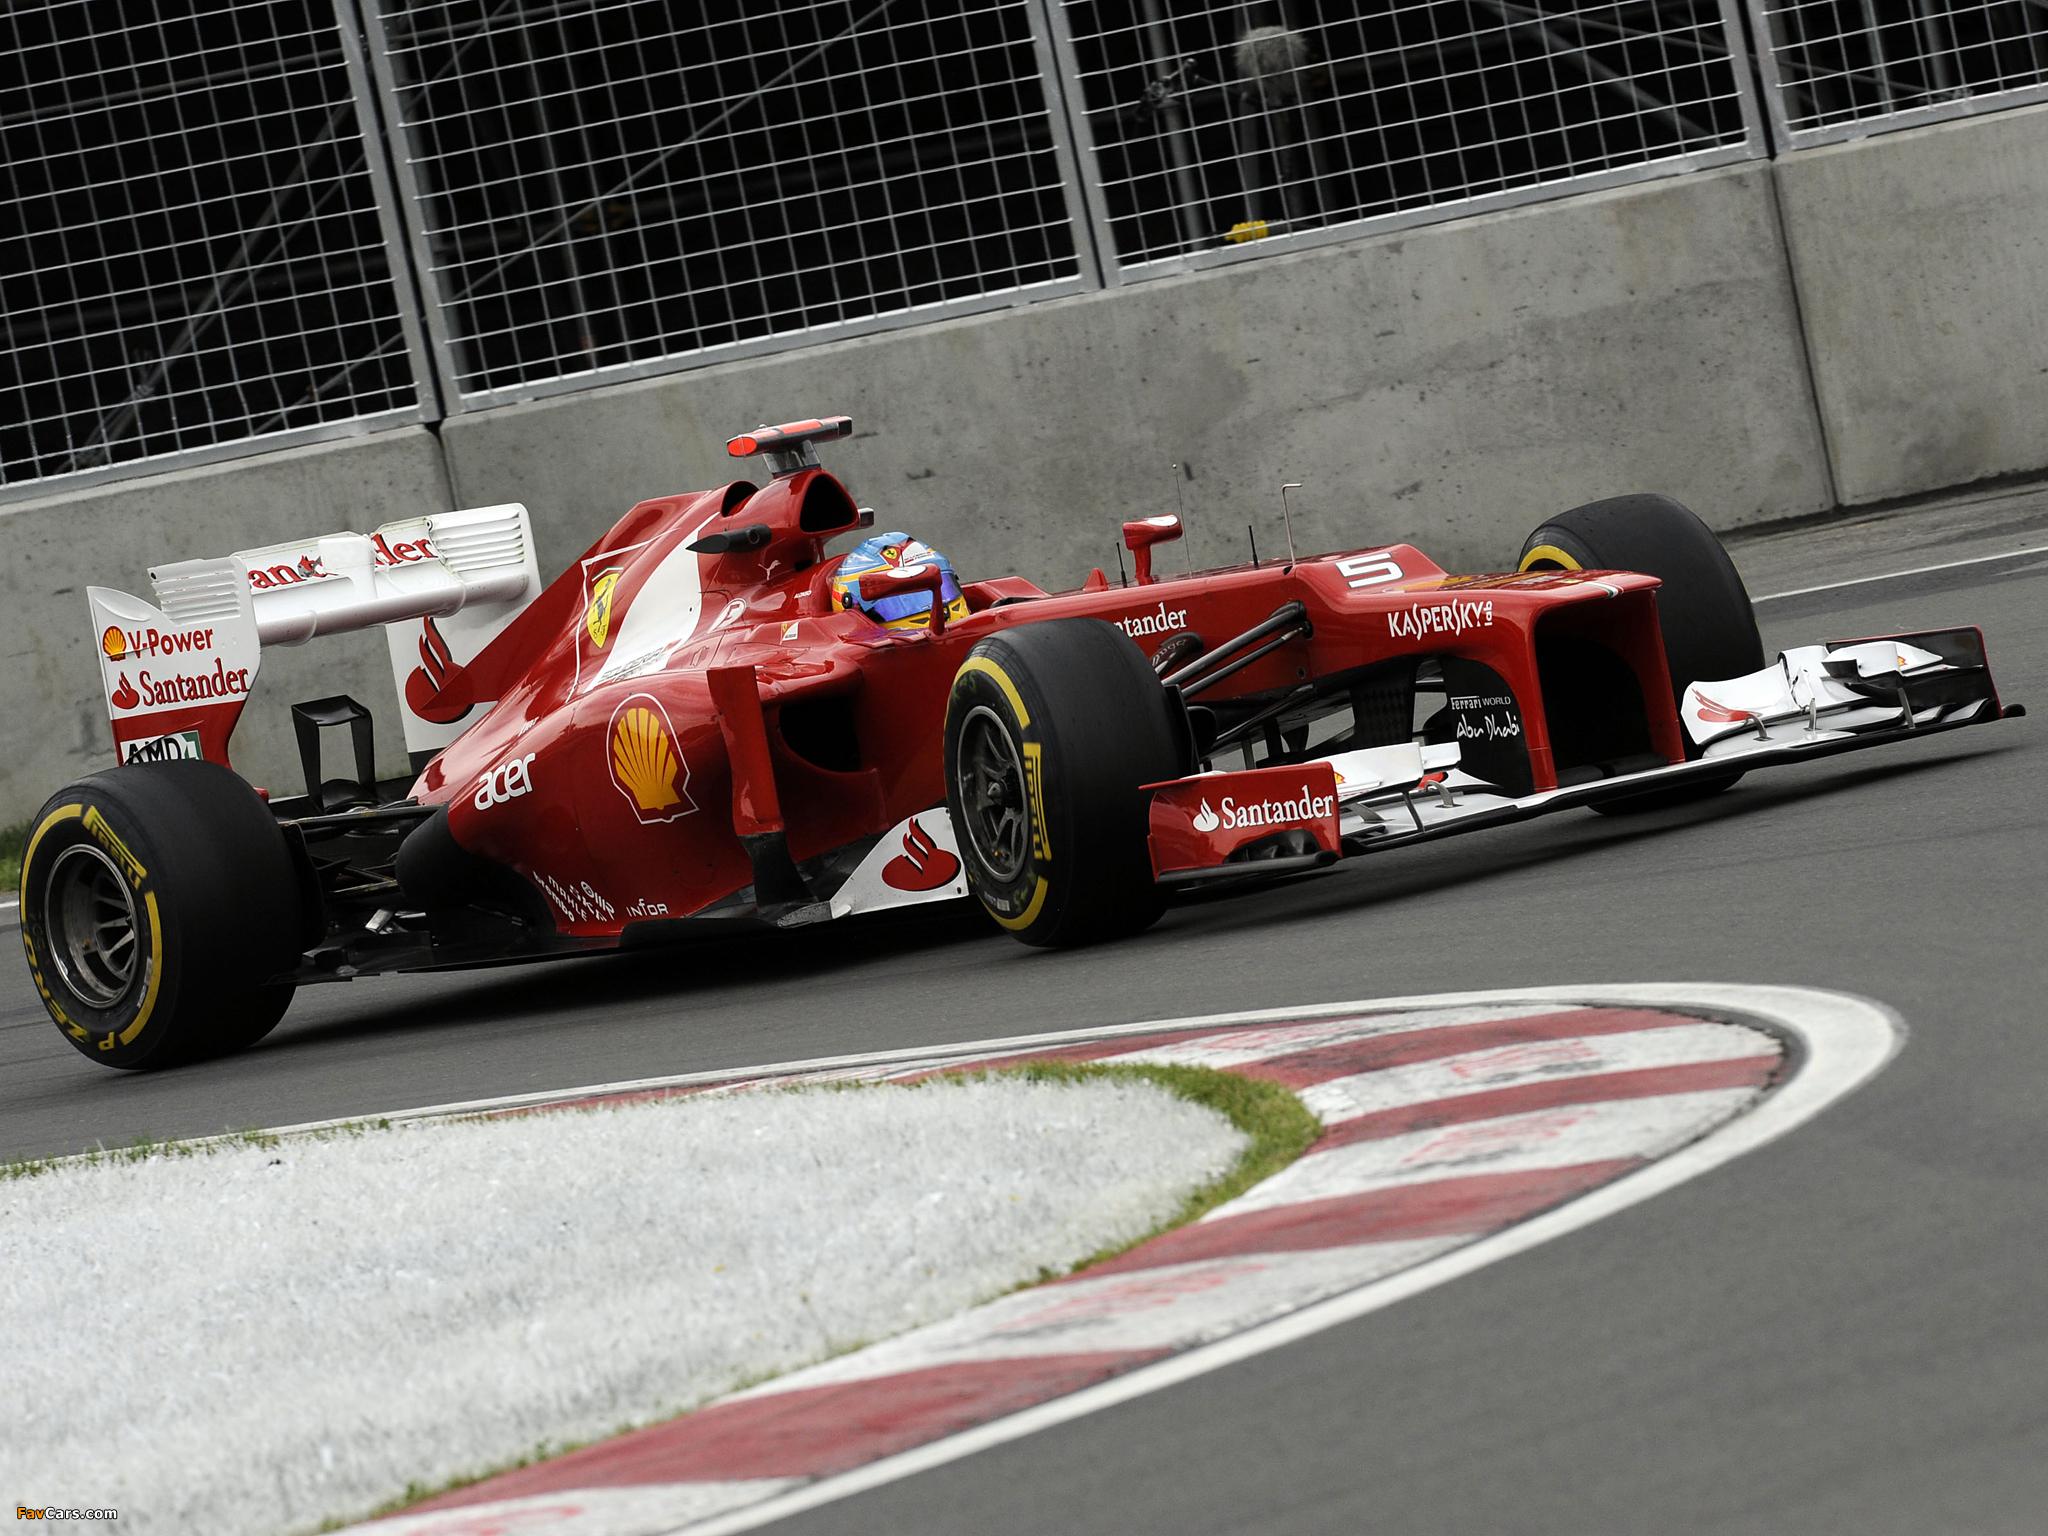 View Ferrari F1 2012 Wallpaper  Background